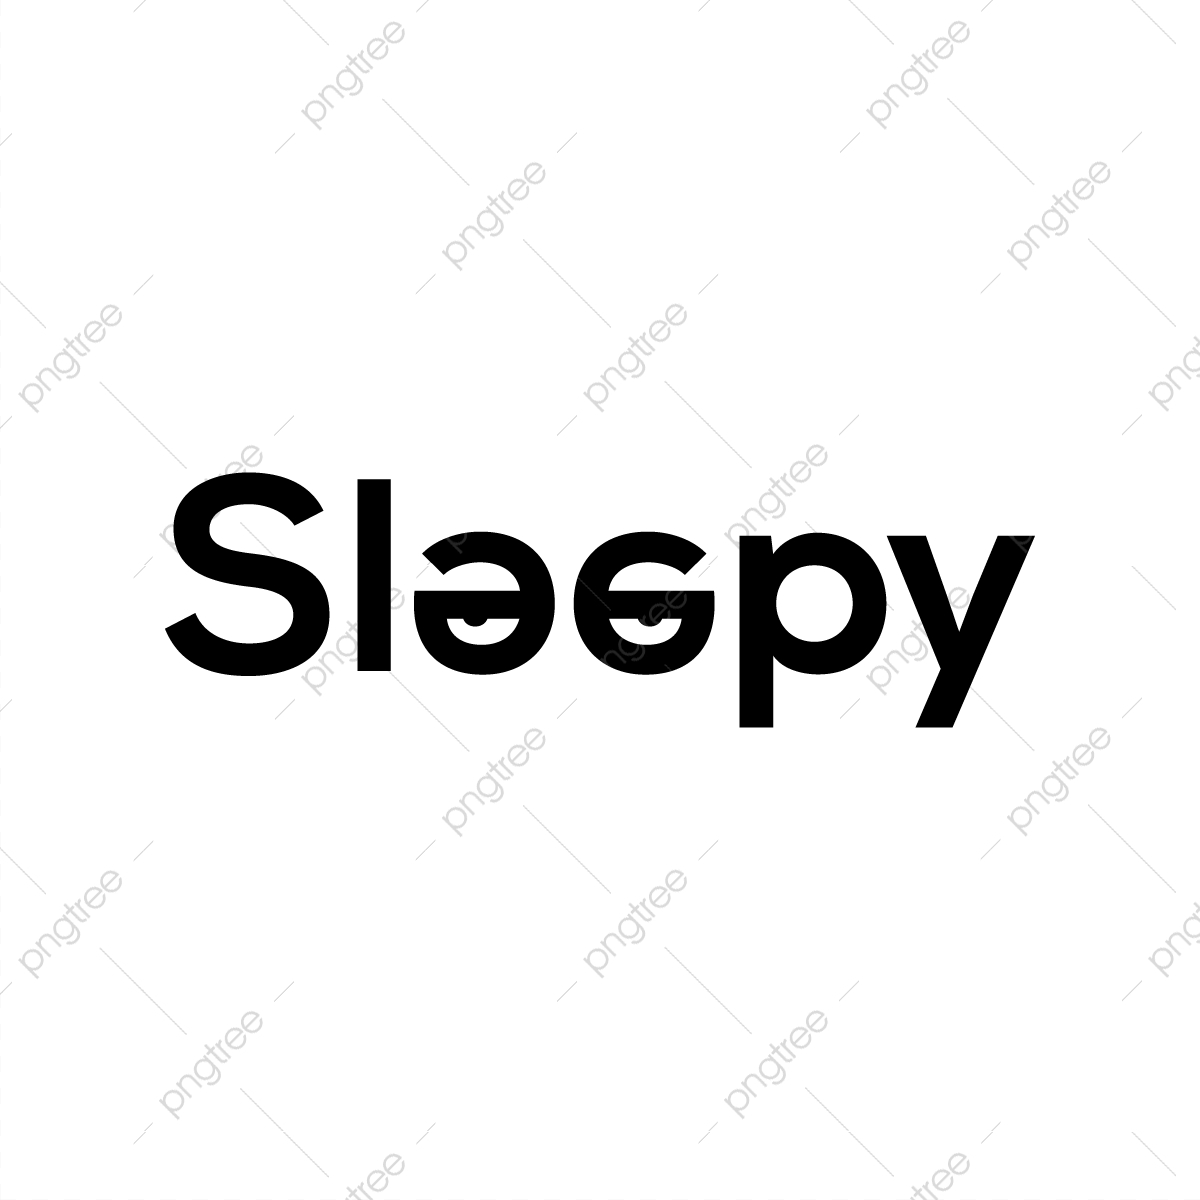 Sleepy Word Art Design, Word Art, Sleepy Design PNG and